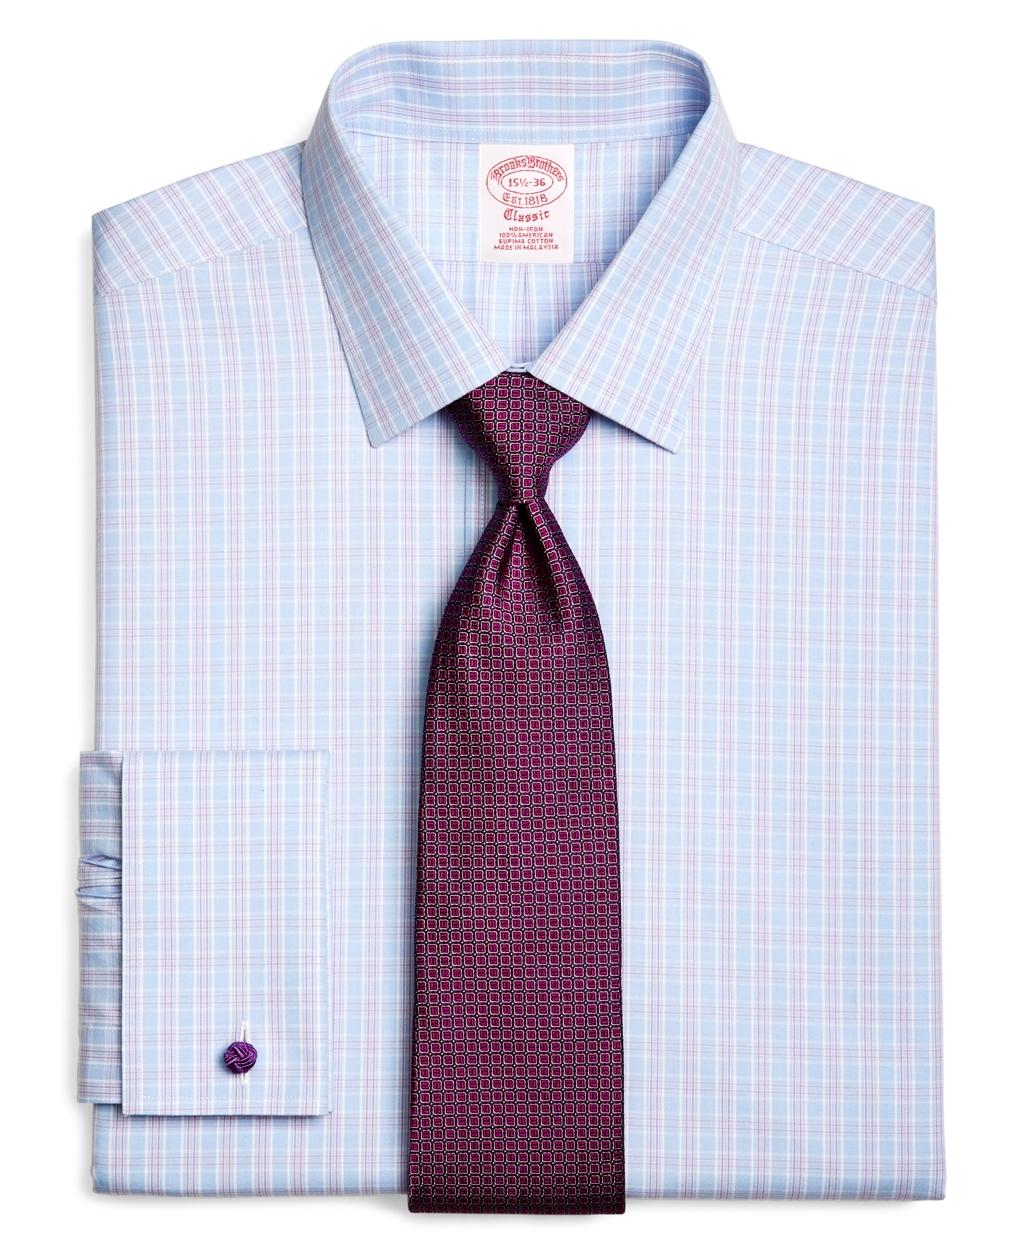 Brooks brothers supima cotton noniron regular fit spread for Supima cotton dress shirts